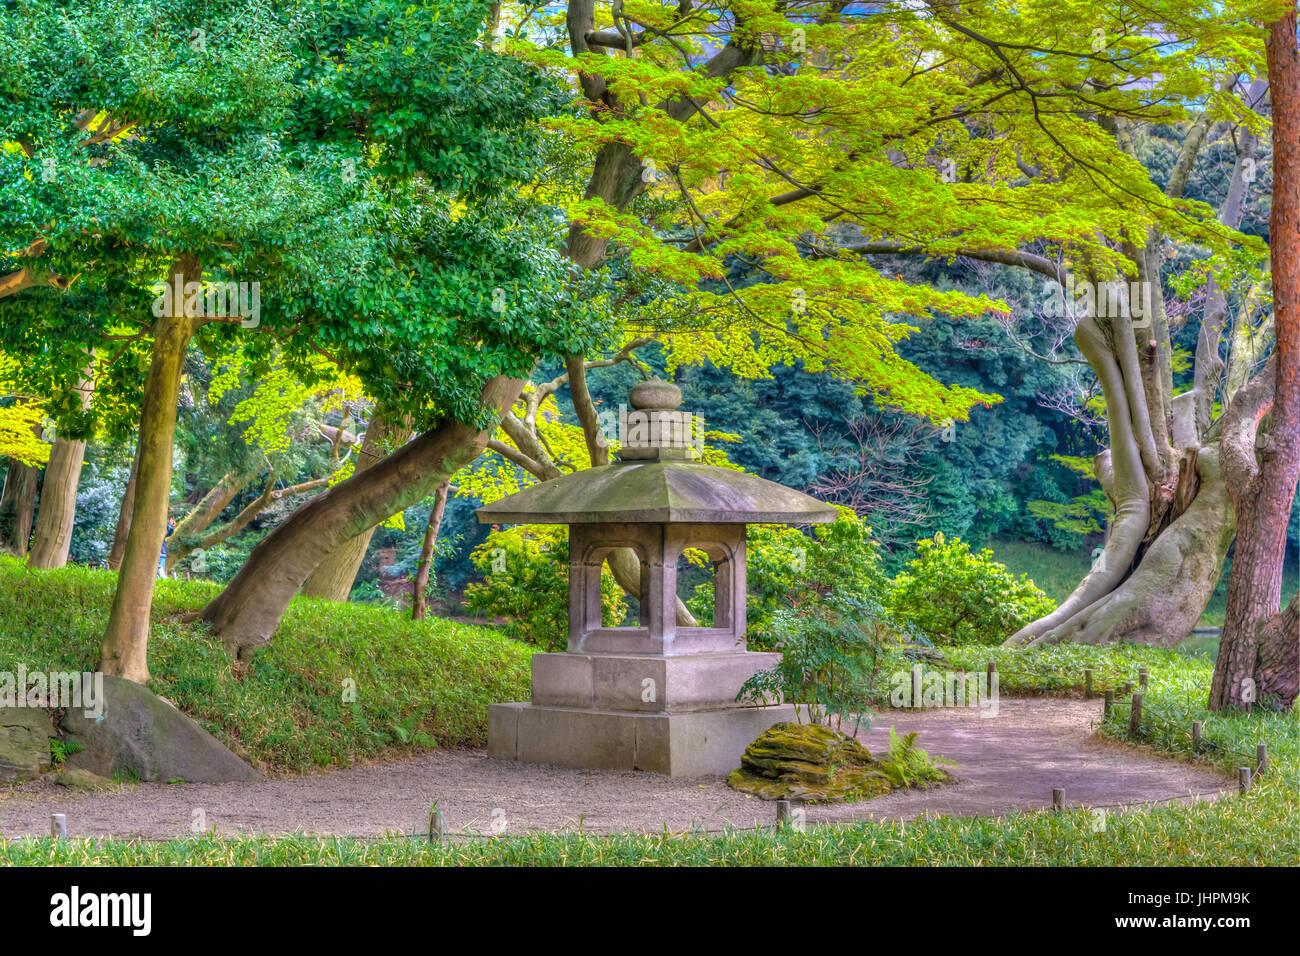 Le Jardin Koishikawa Kōrakuen Jardins en Bunkyo, Tokyo, Japon. Photo Stock